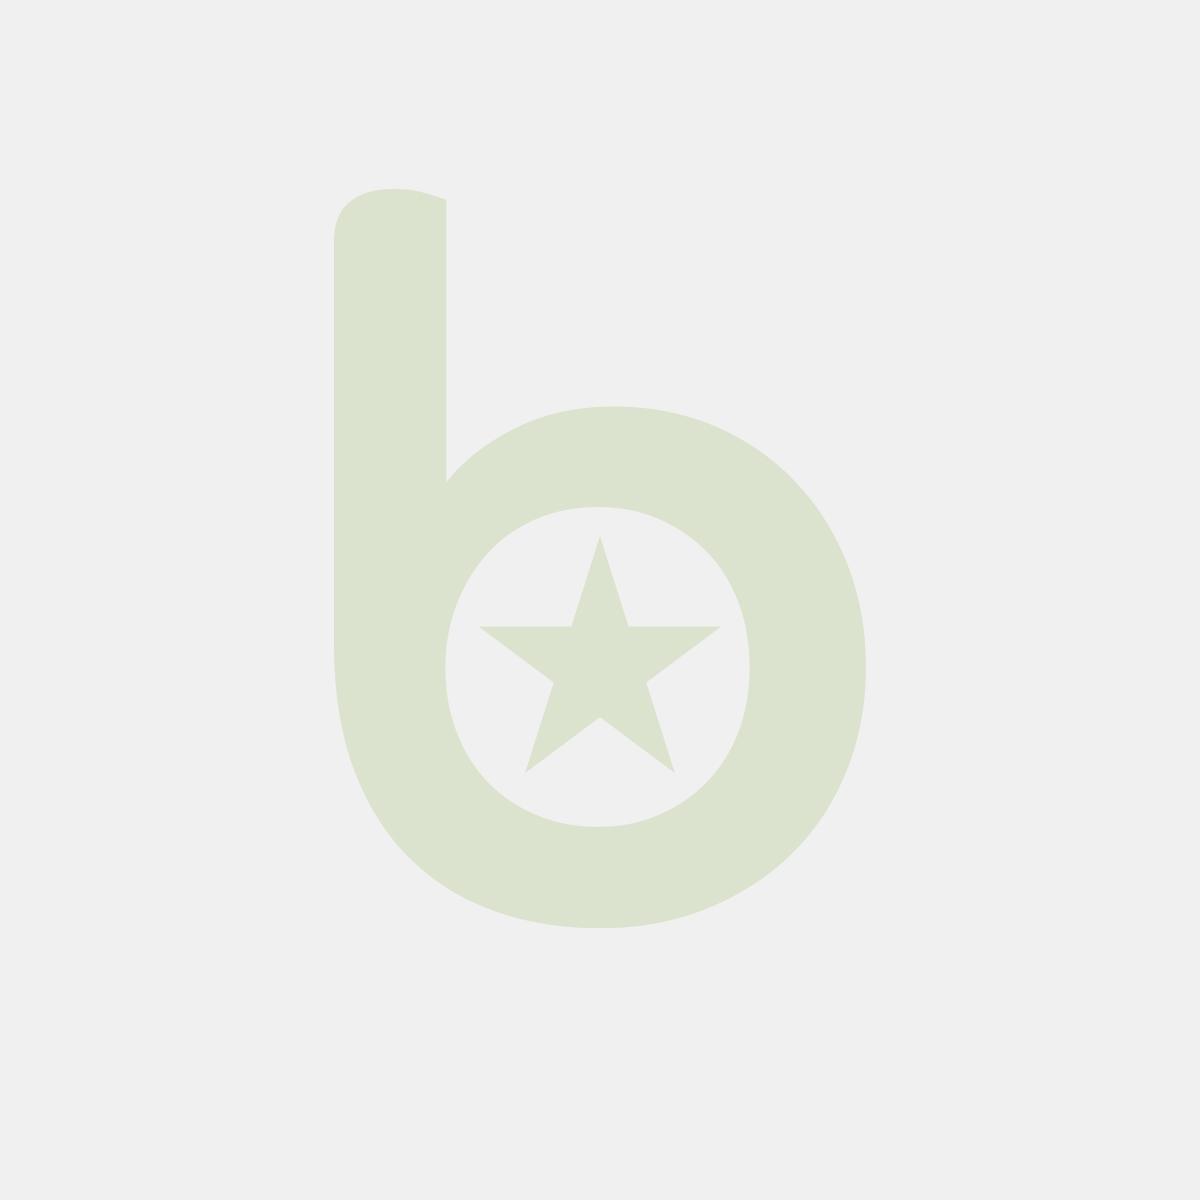 Bindownica GBC CombBind C110, A4/A3 pion., czarna